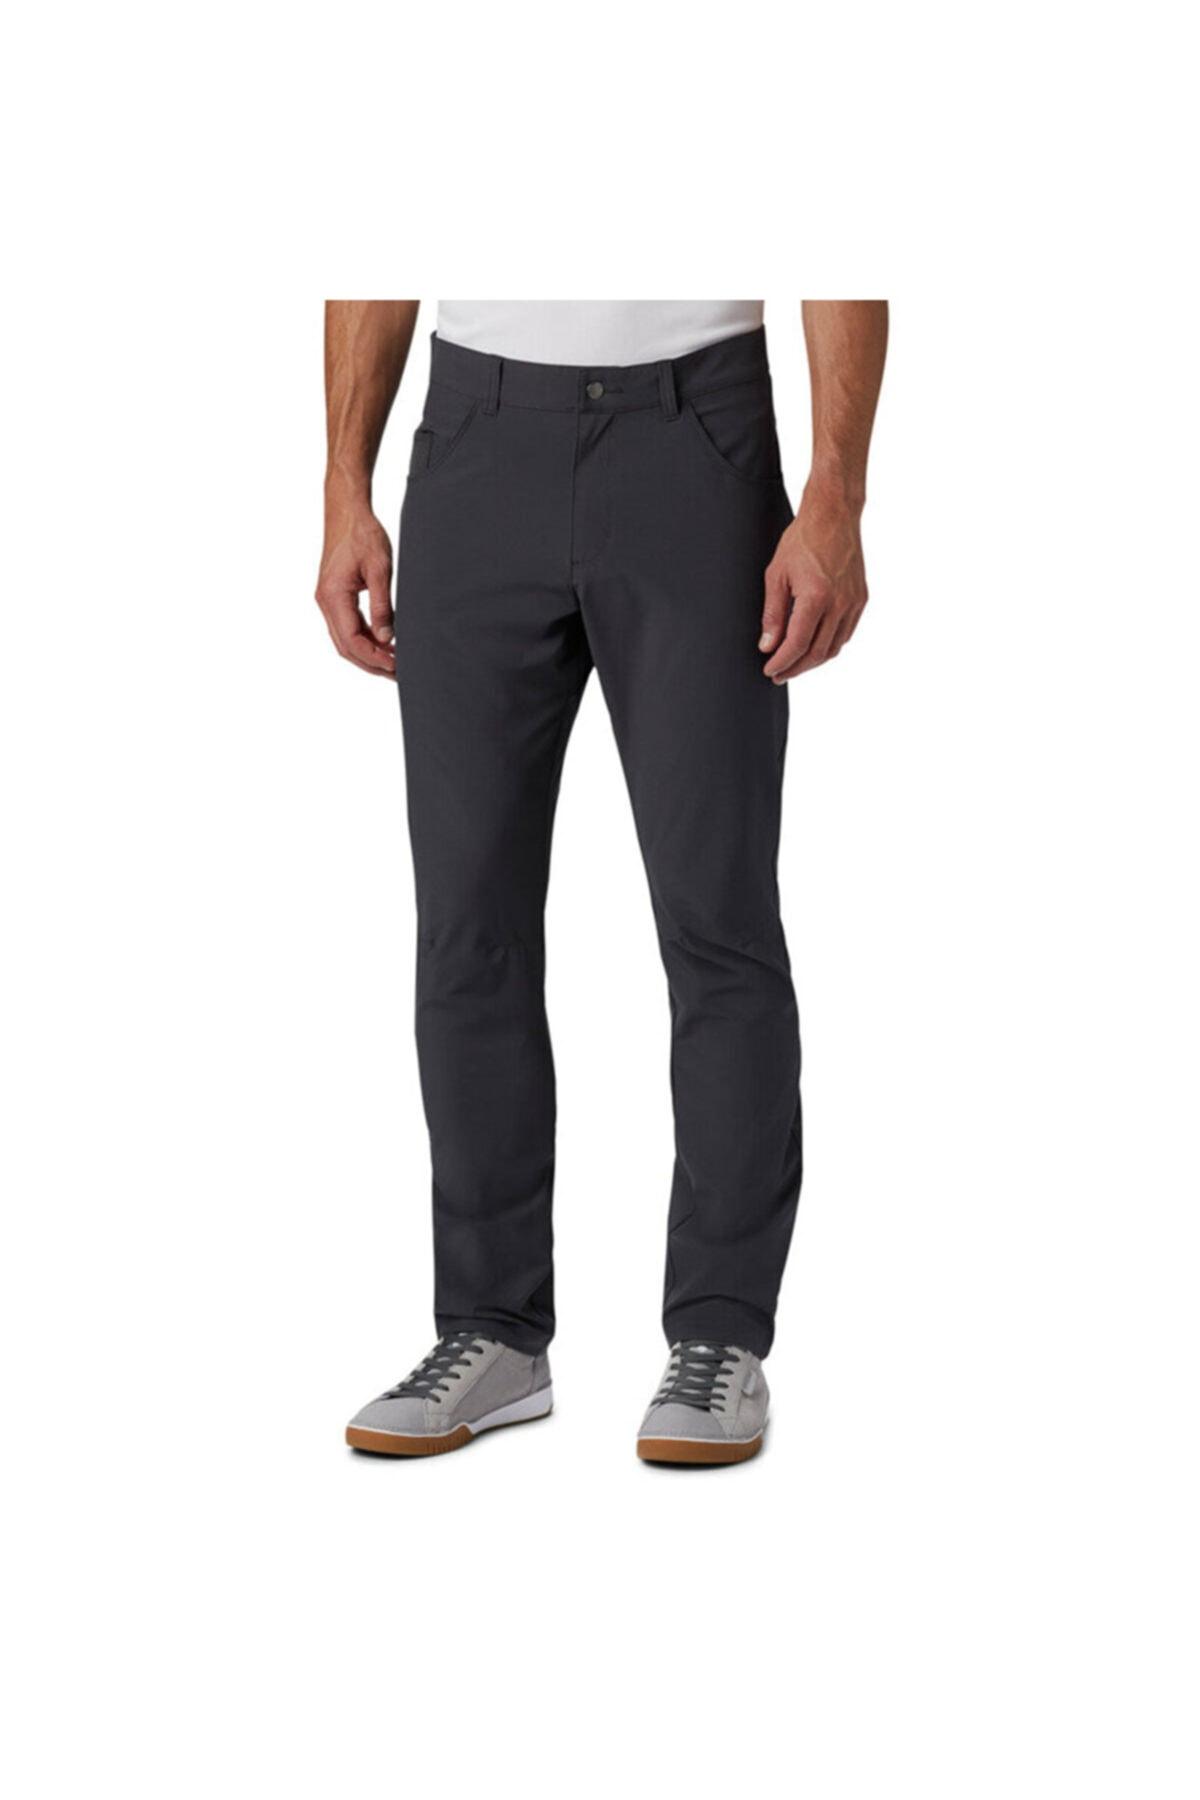 Elements Stretch Pant Erkek Siyah Outdoor Pantolon Ao0349-011